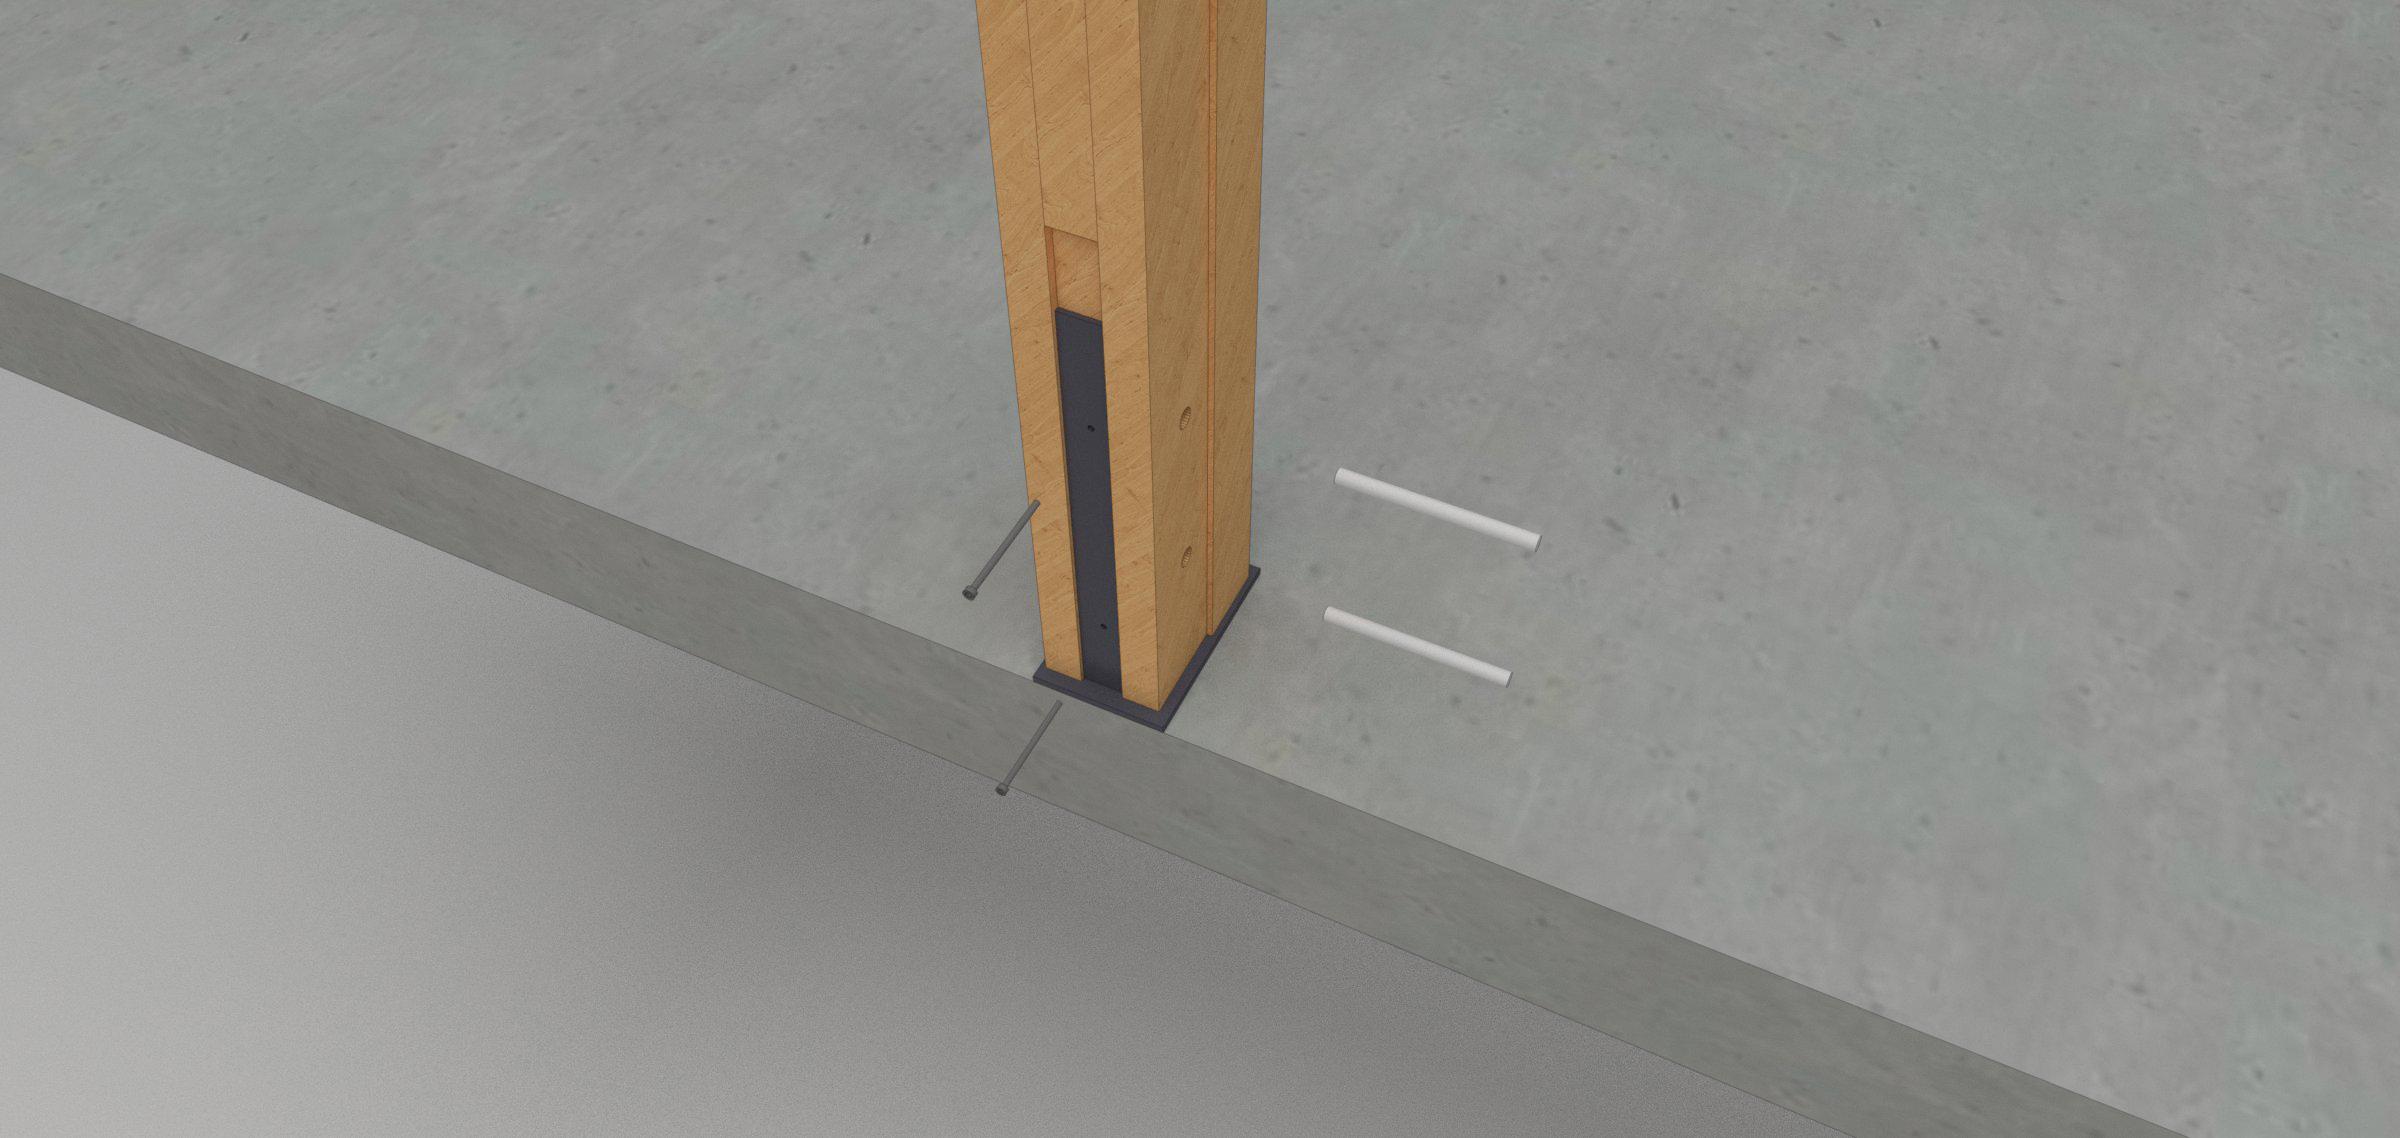 Frame Post Installation